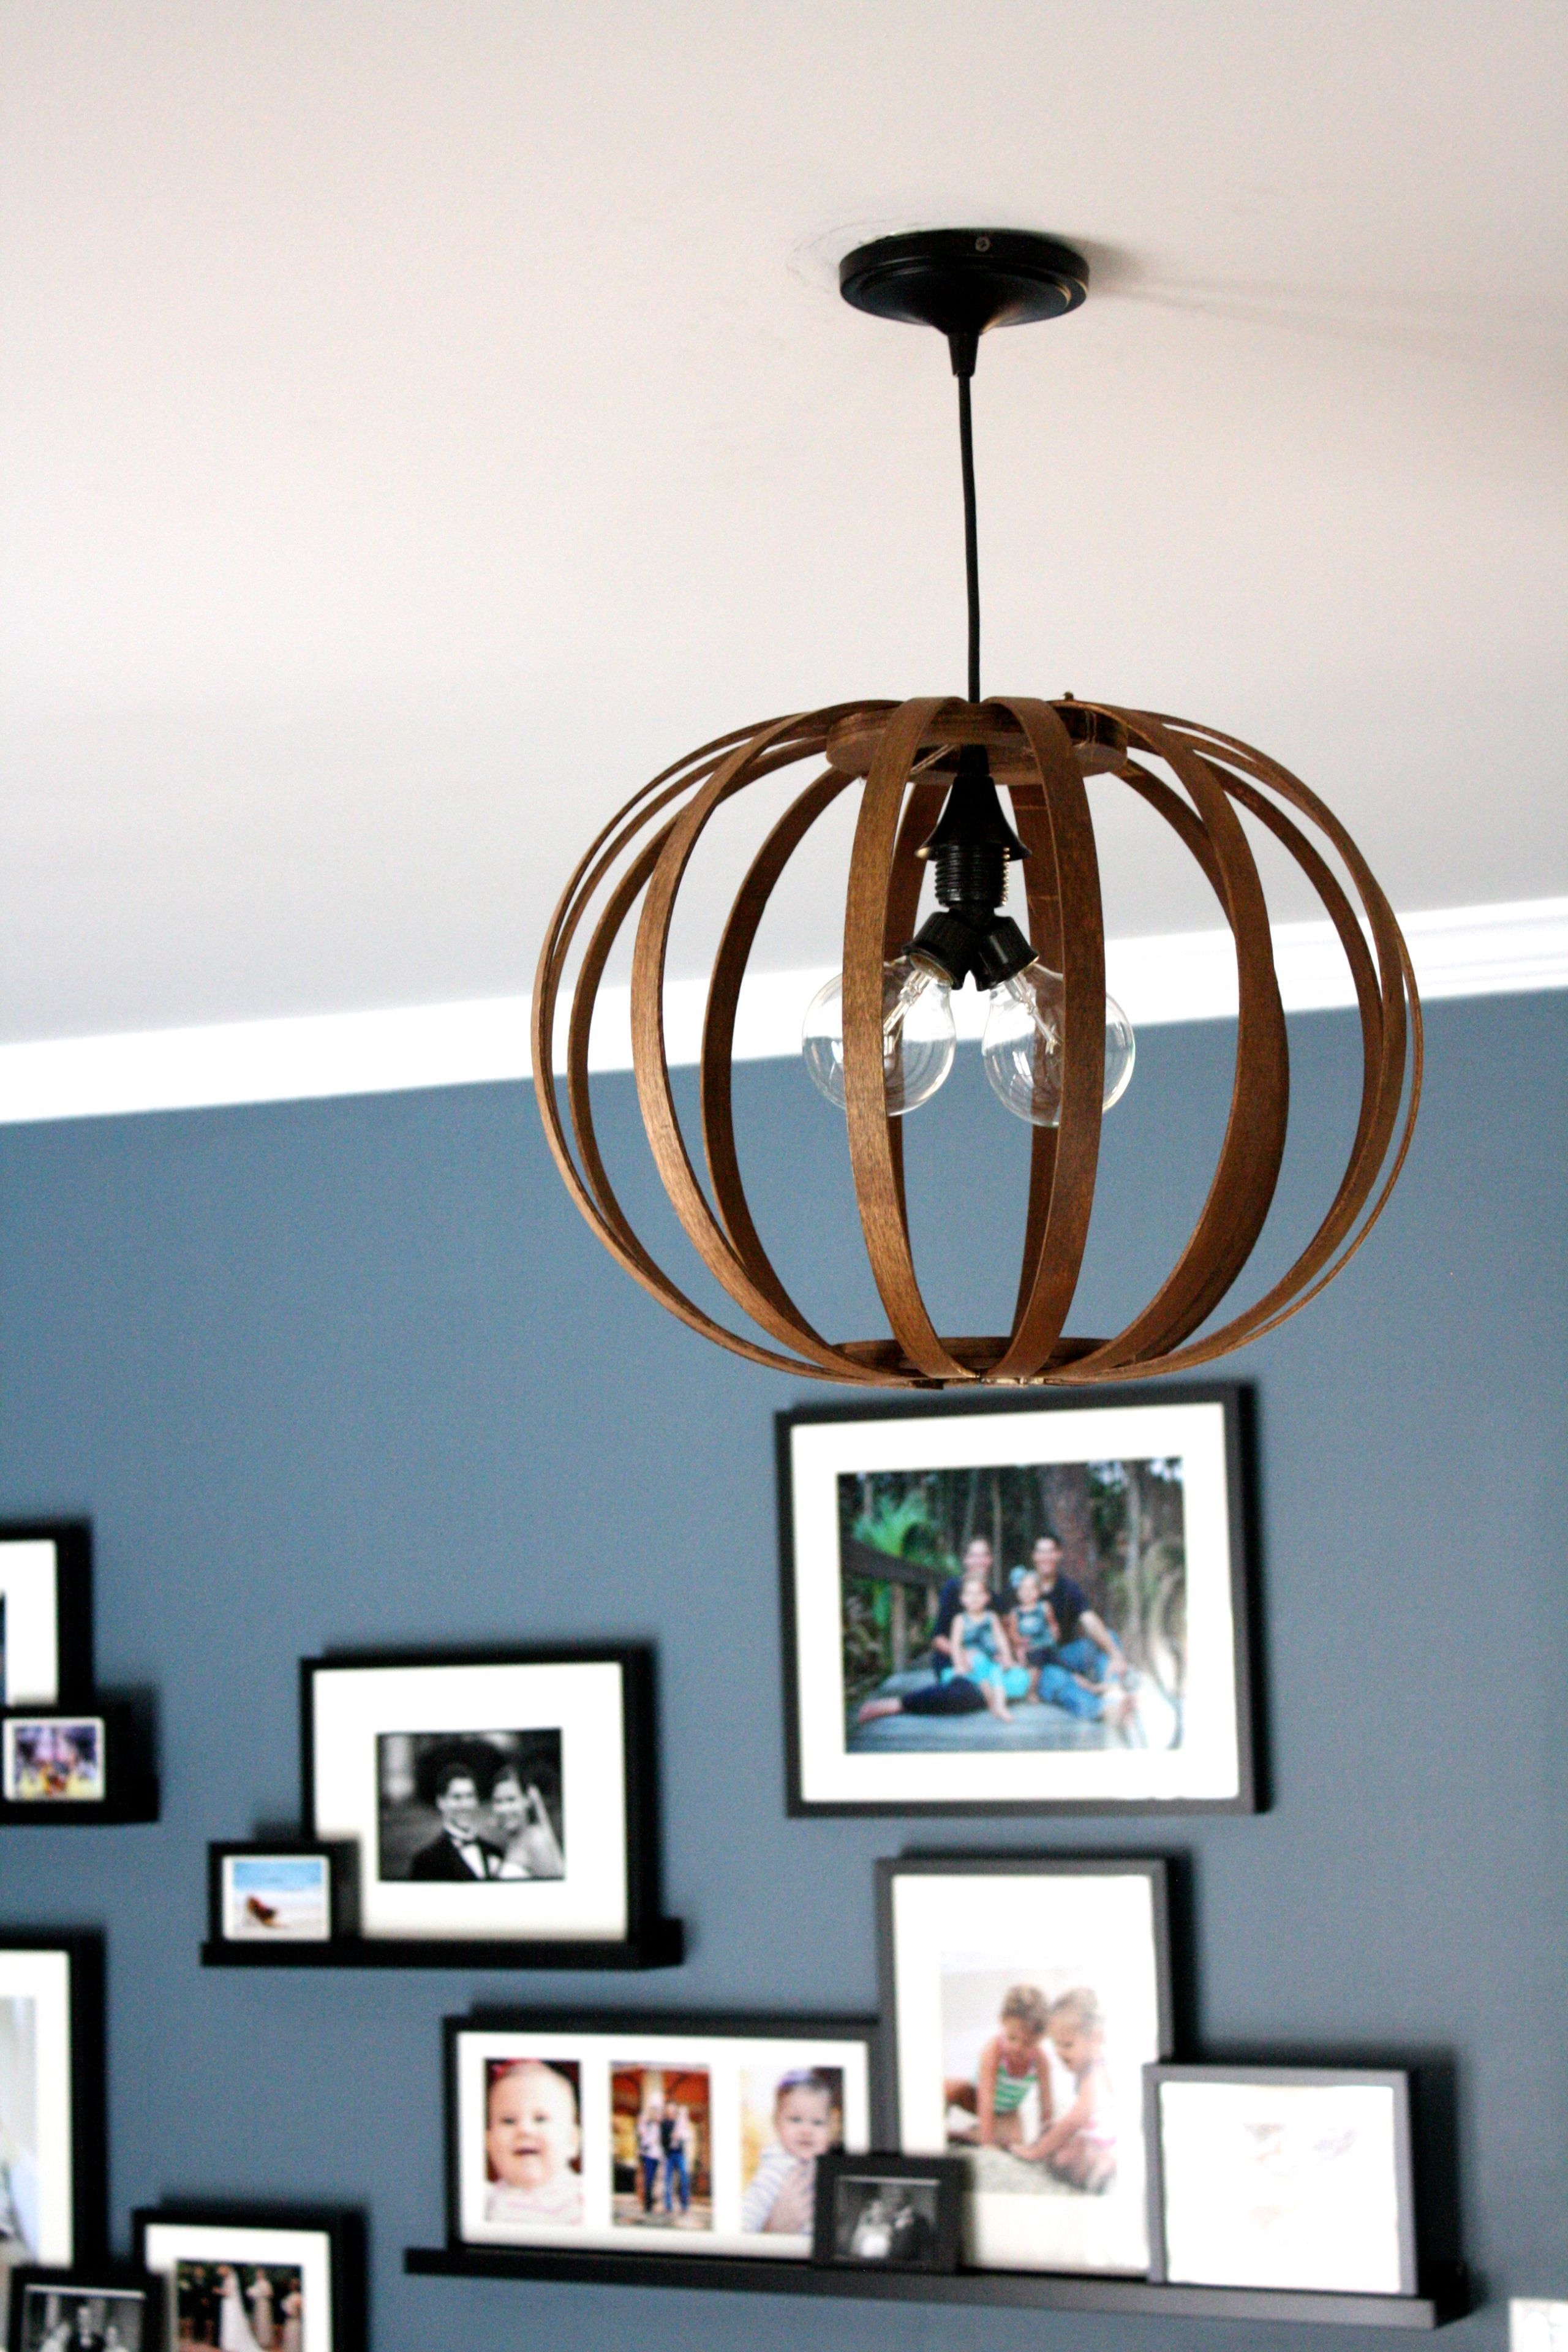 Pendant Lighting - Pendant Lighting Ideas